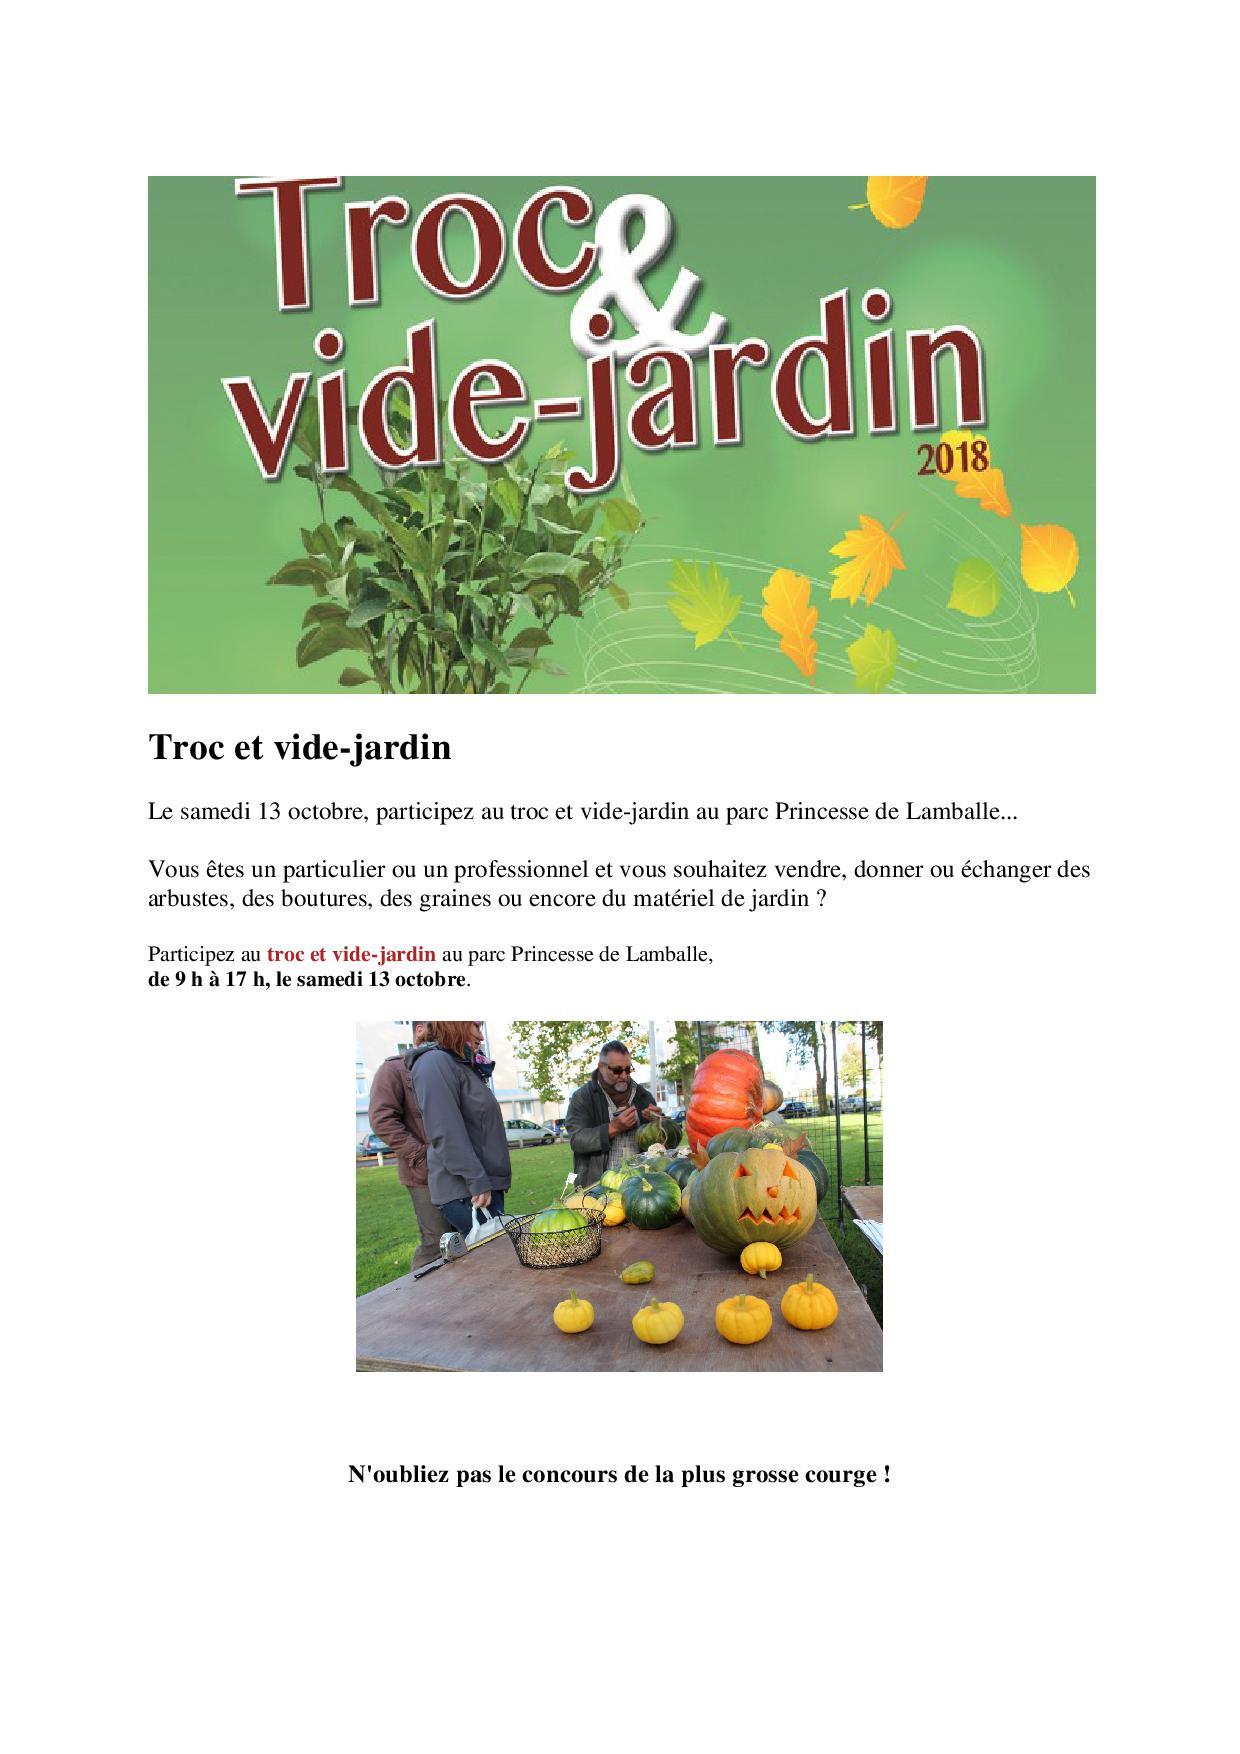 Document1 Troc et Vide Jardin 2018 (13.10.2018).jpg